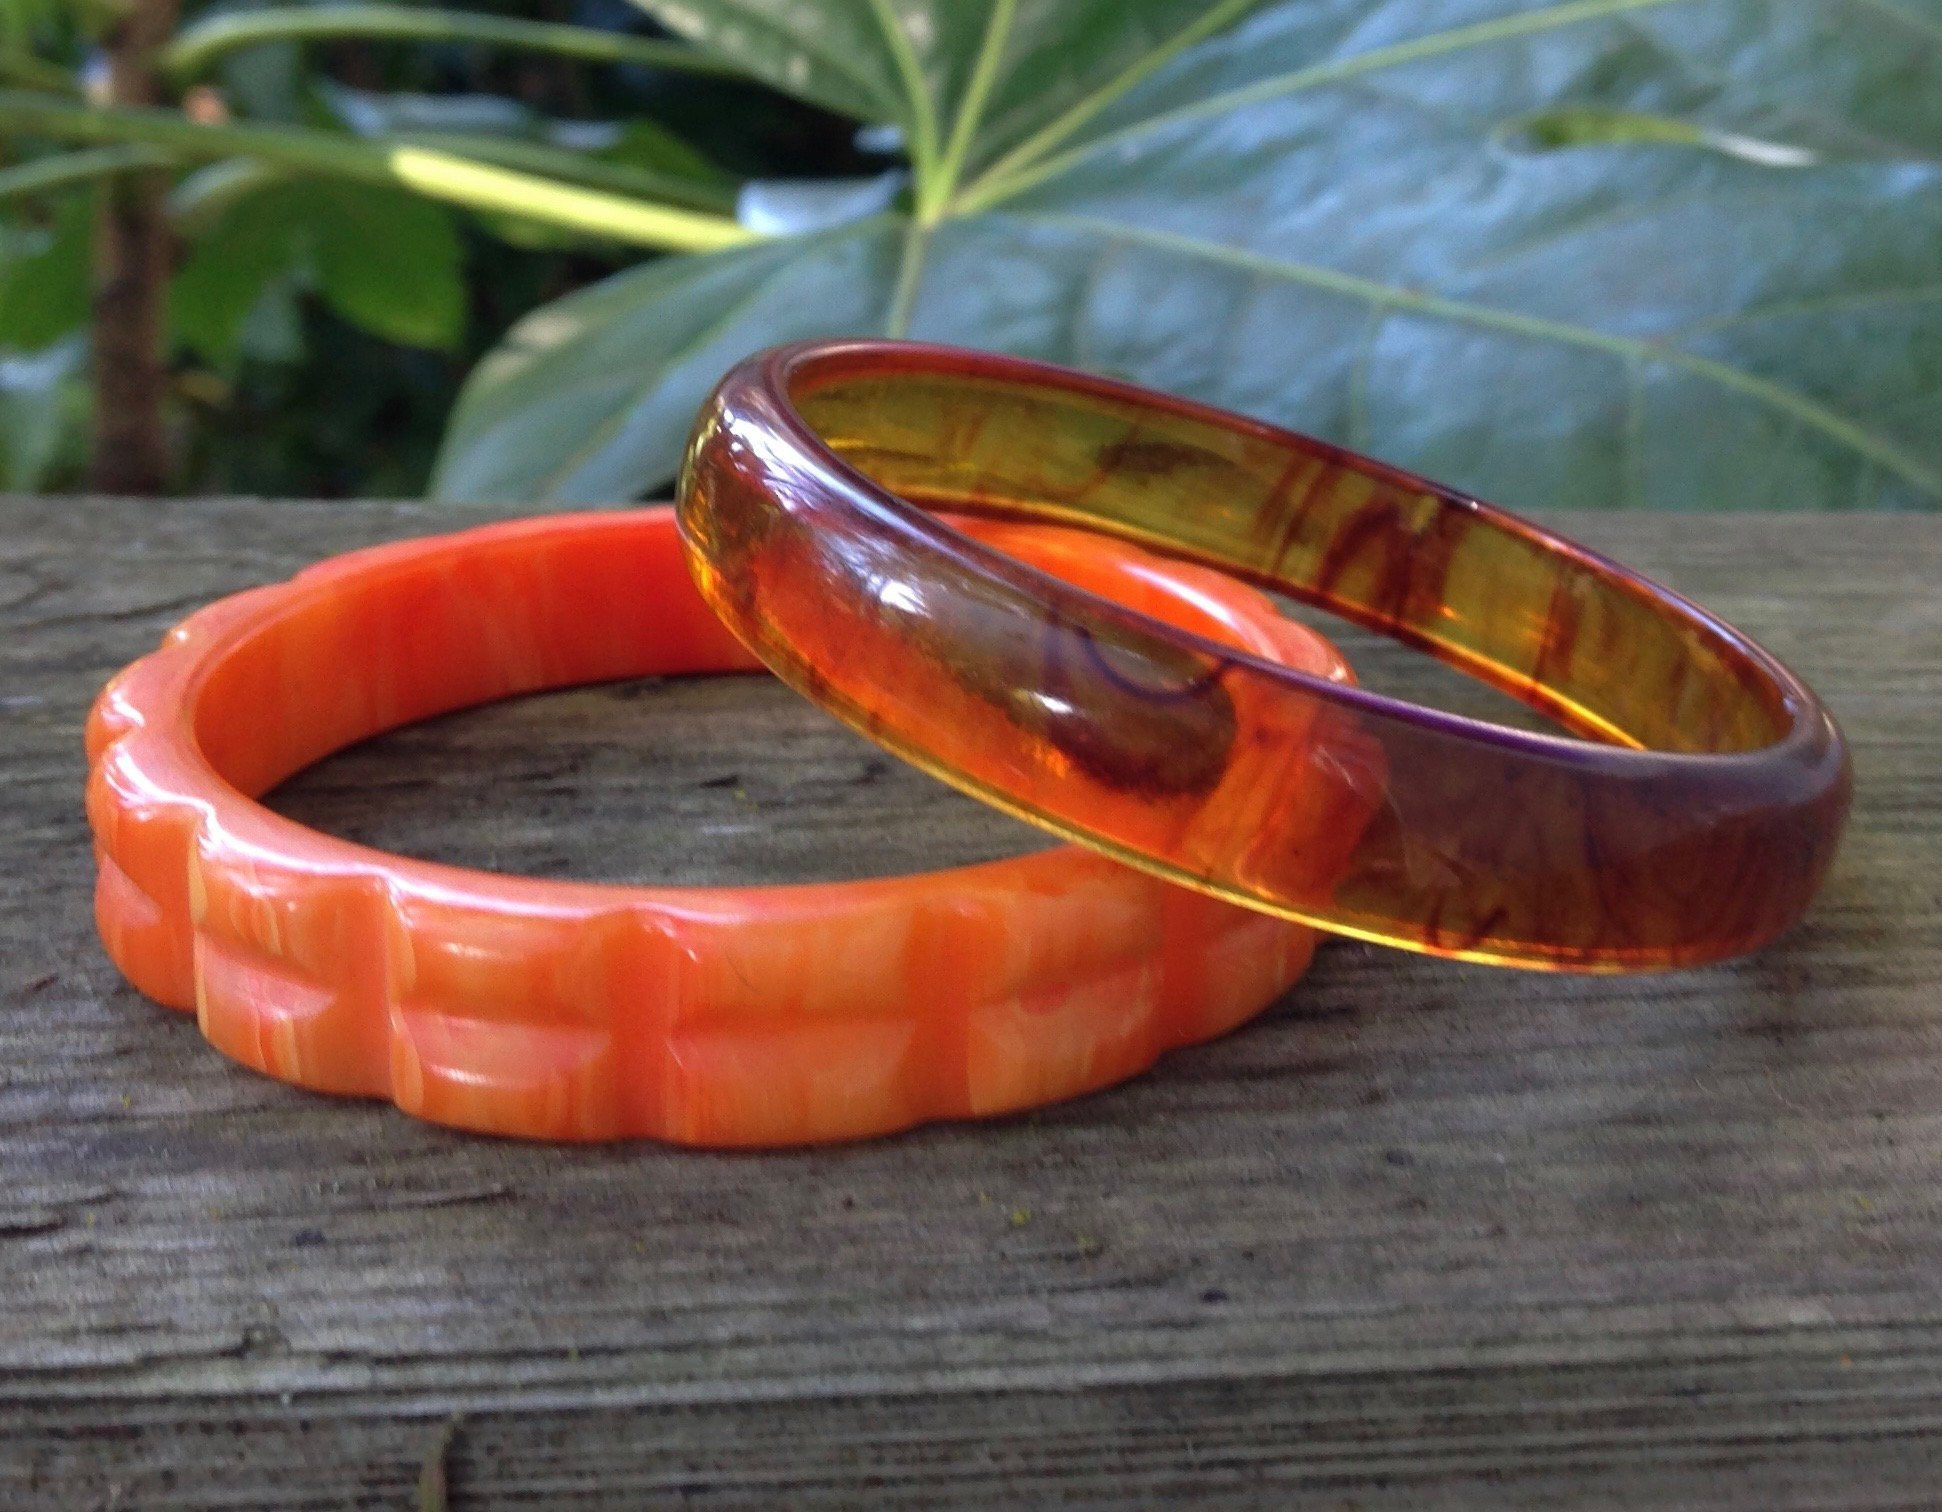 b007af34674bb Vintage Pair of Bakelite Bangle Bracelets, Swirled Tangerine & Apple ...